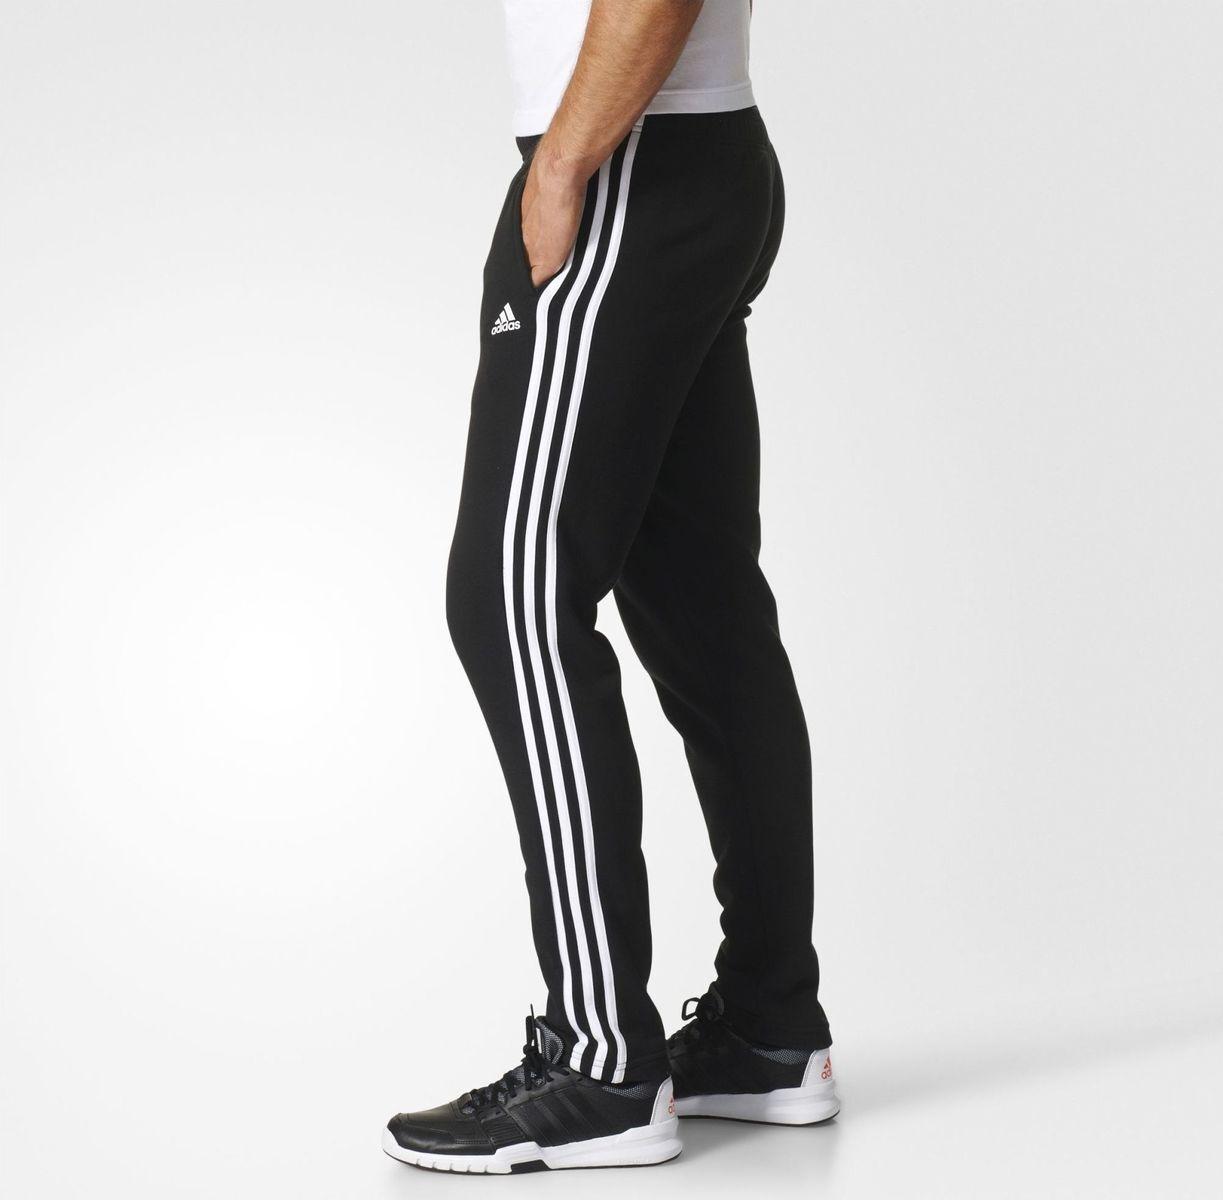 Adidas Uomo Pantaloni da Corsa Essential 3 Strisce Sportiva Moda Palestra BK7446